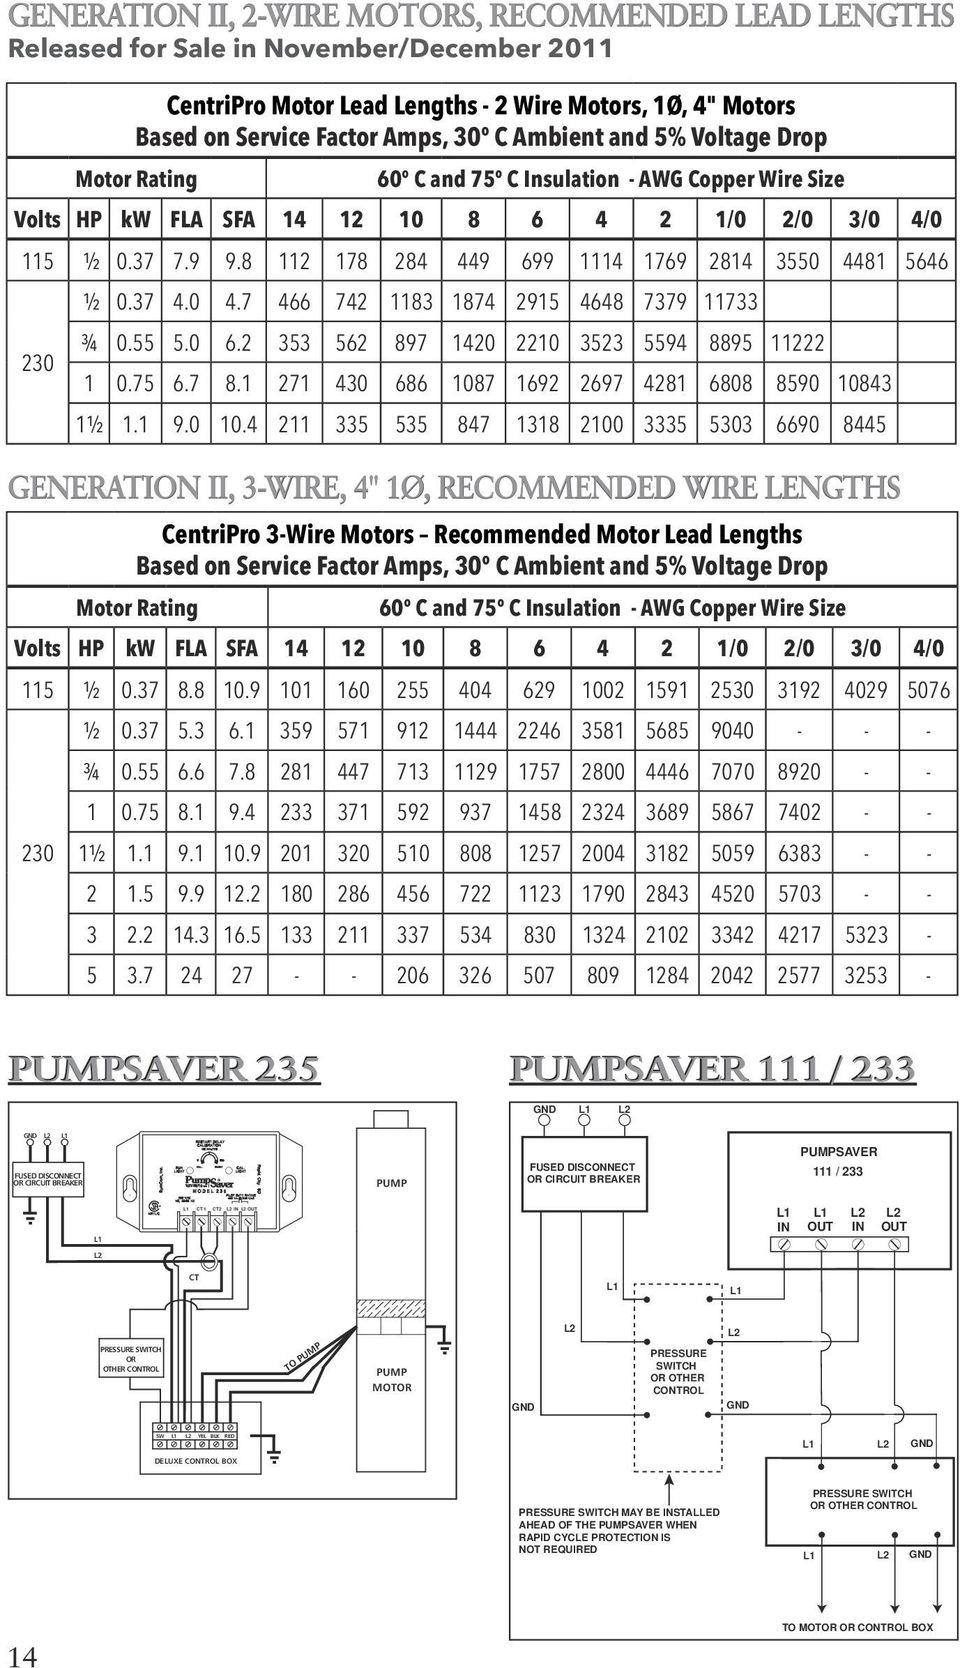 siga ct1 wiring diagram Collection-Siga Ct1 Wiring Diagram New Siga Ct1 Wiring Diagram Siga Io 18-f